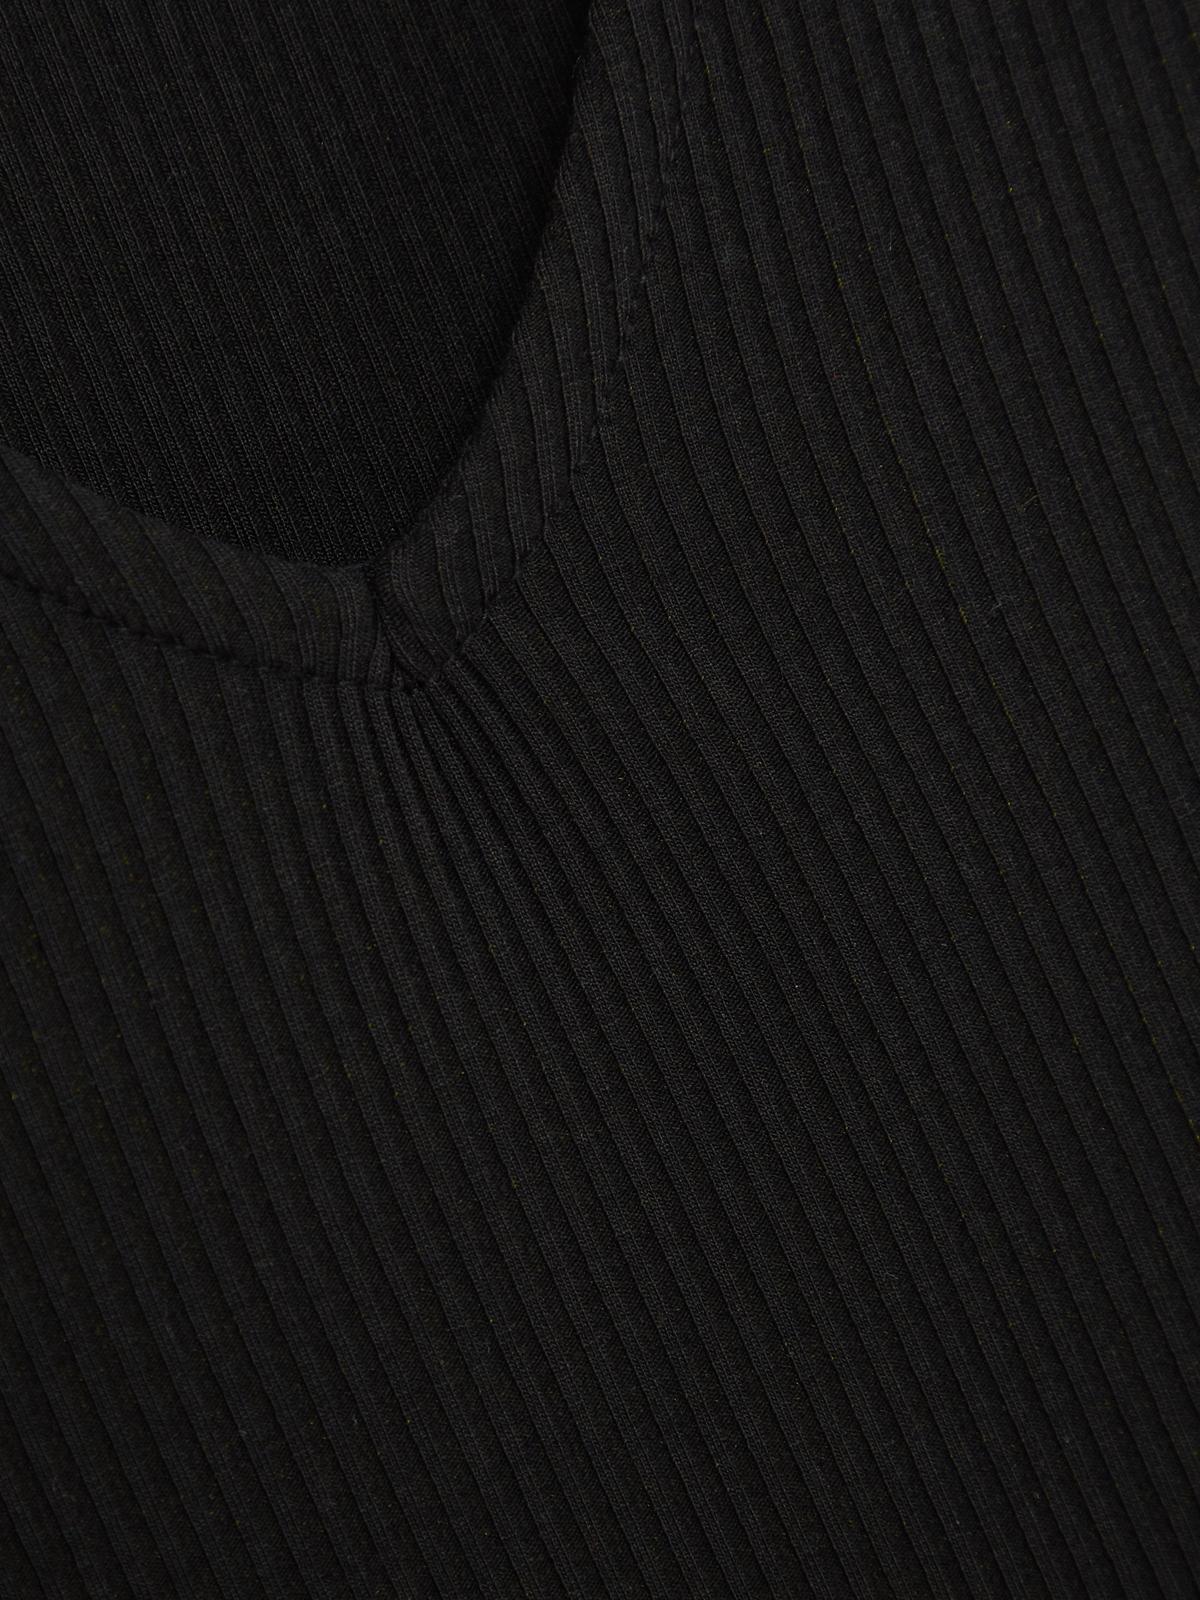 Trimmed Rib Top Black